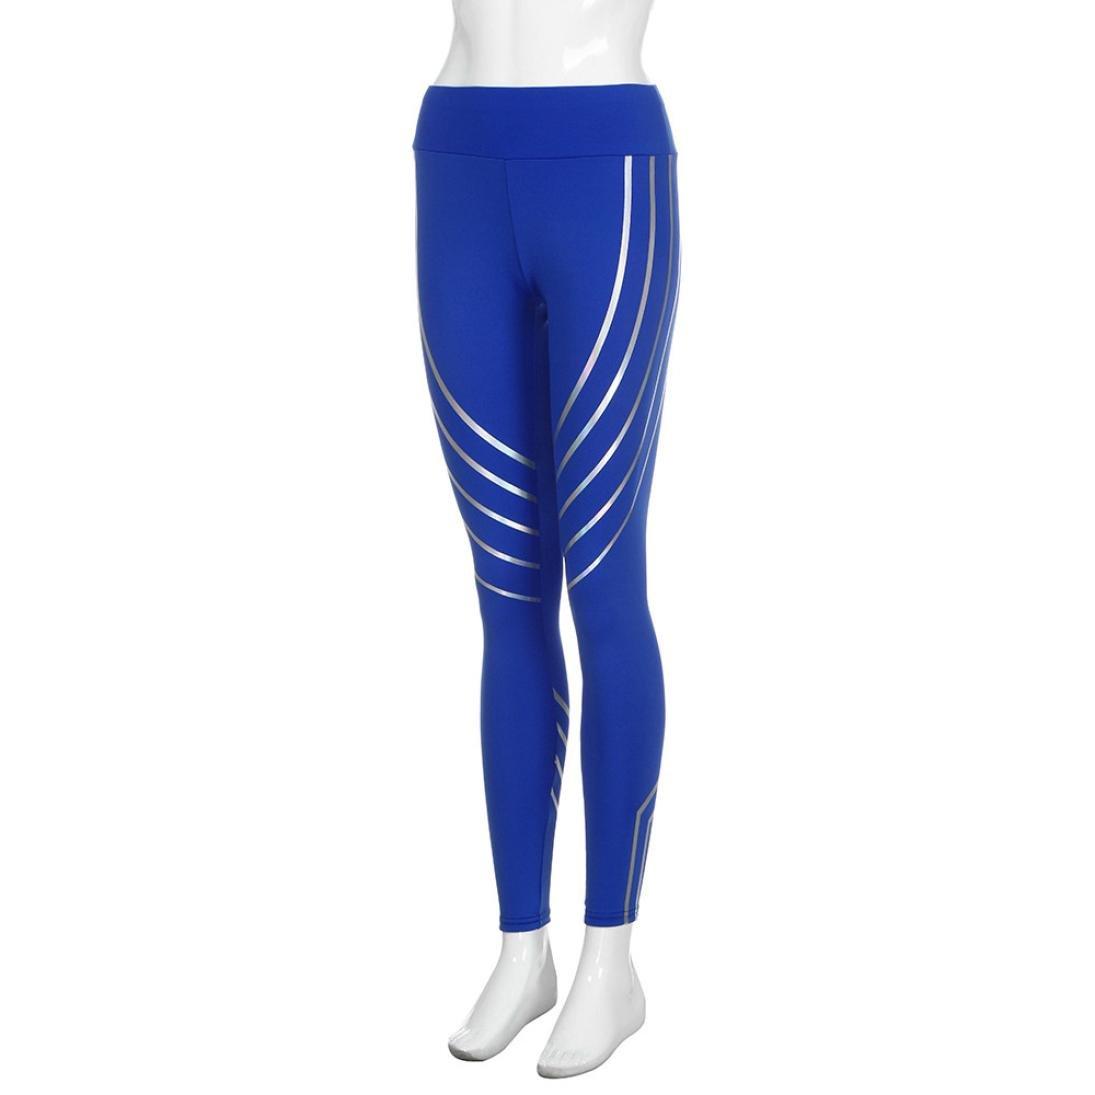 Pantalones Yoga Mujeres, ❤️Xinantime Polainas de Fitness Yoga para Mujeres Running Gym Stretch Sports Pants Pantalones